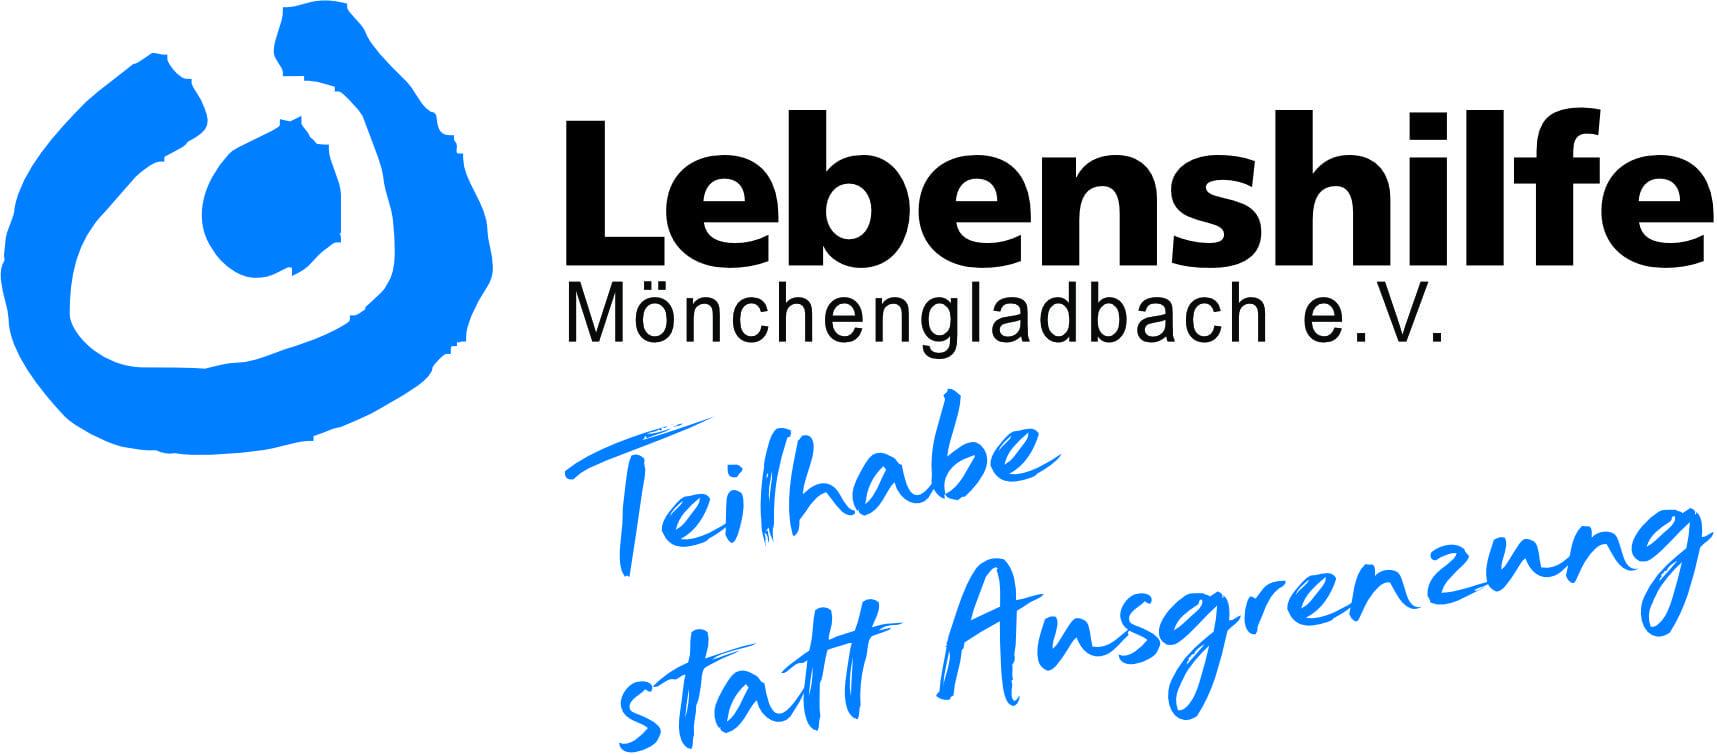 Lebenshilfe Mönchengladbach gGmbH